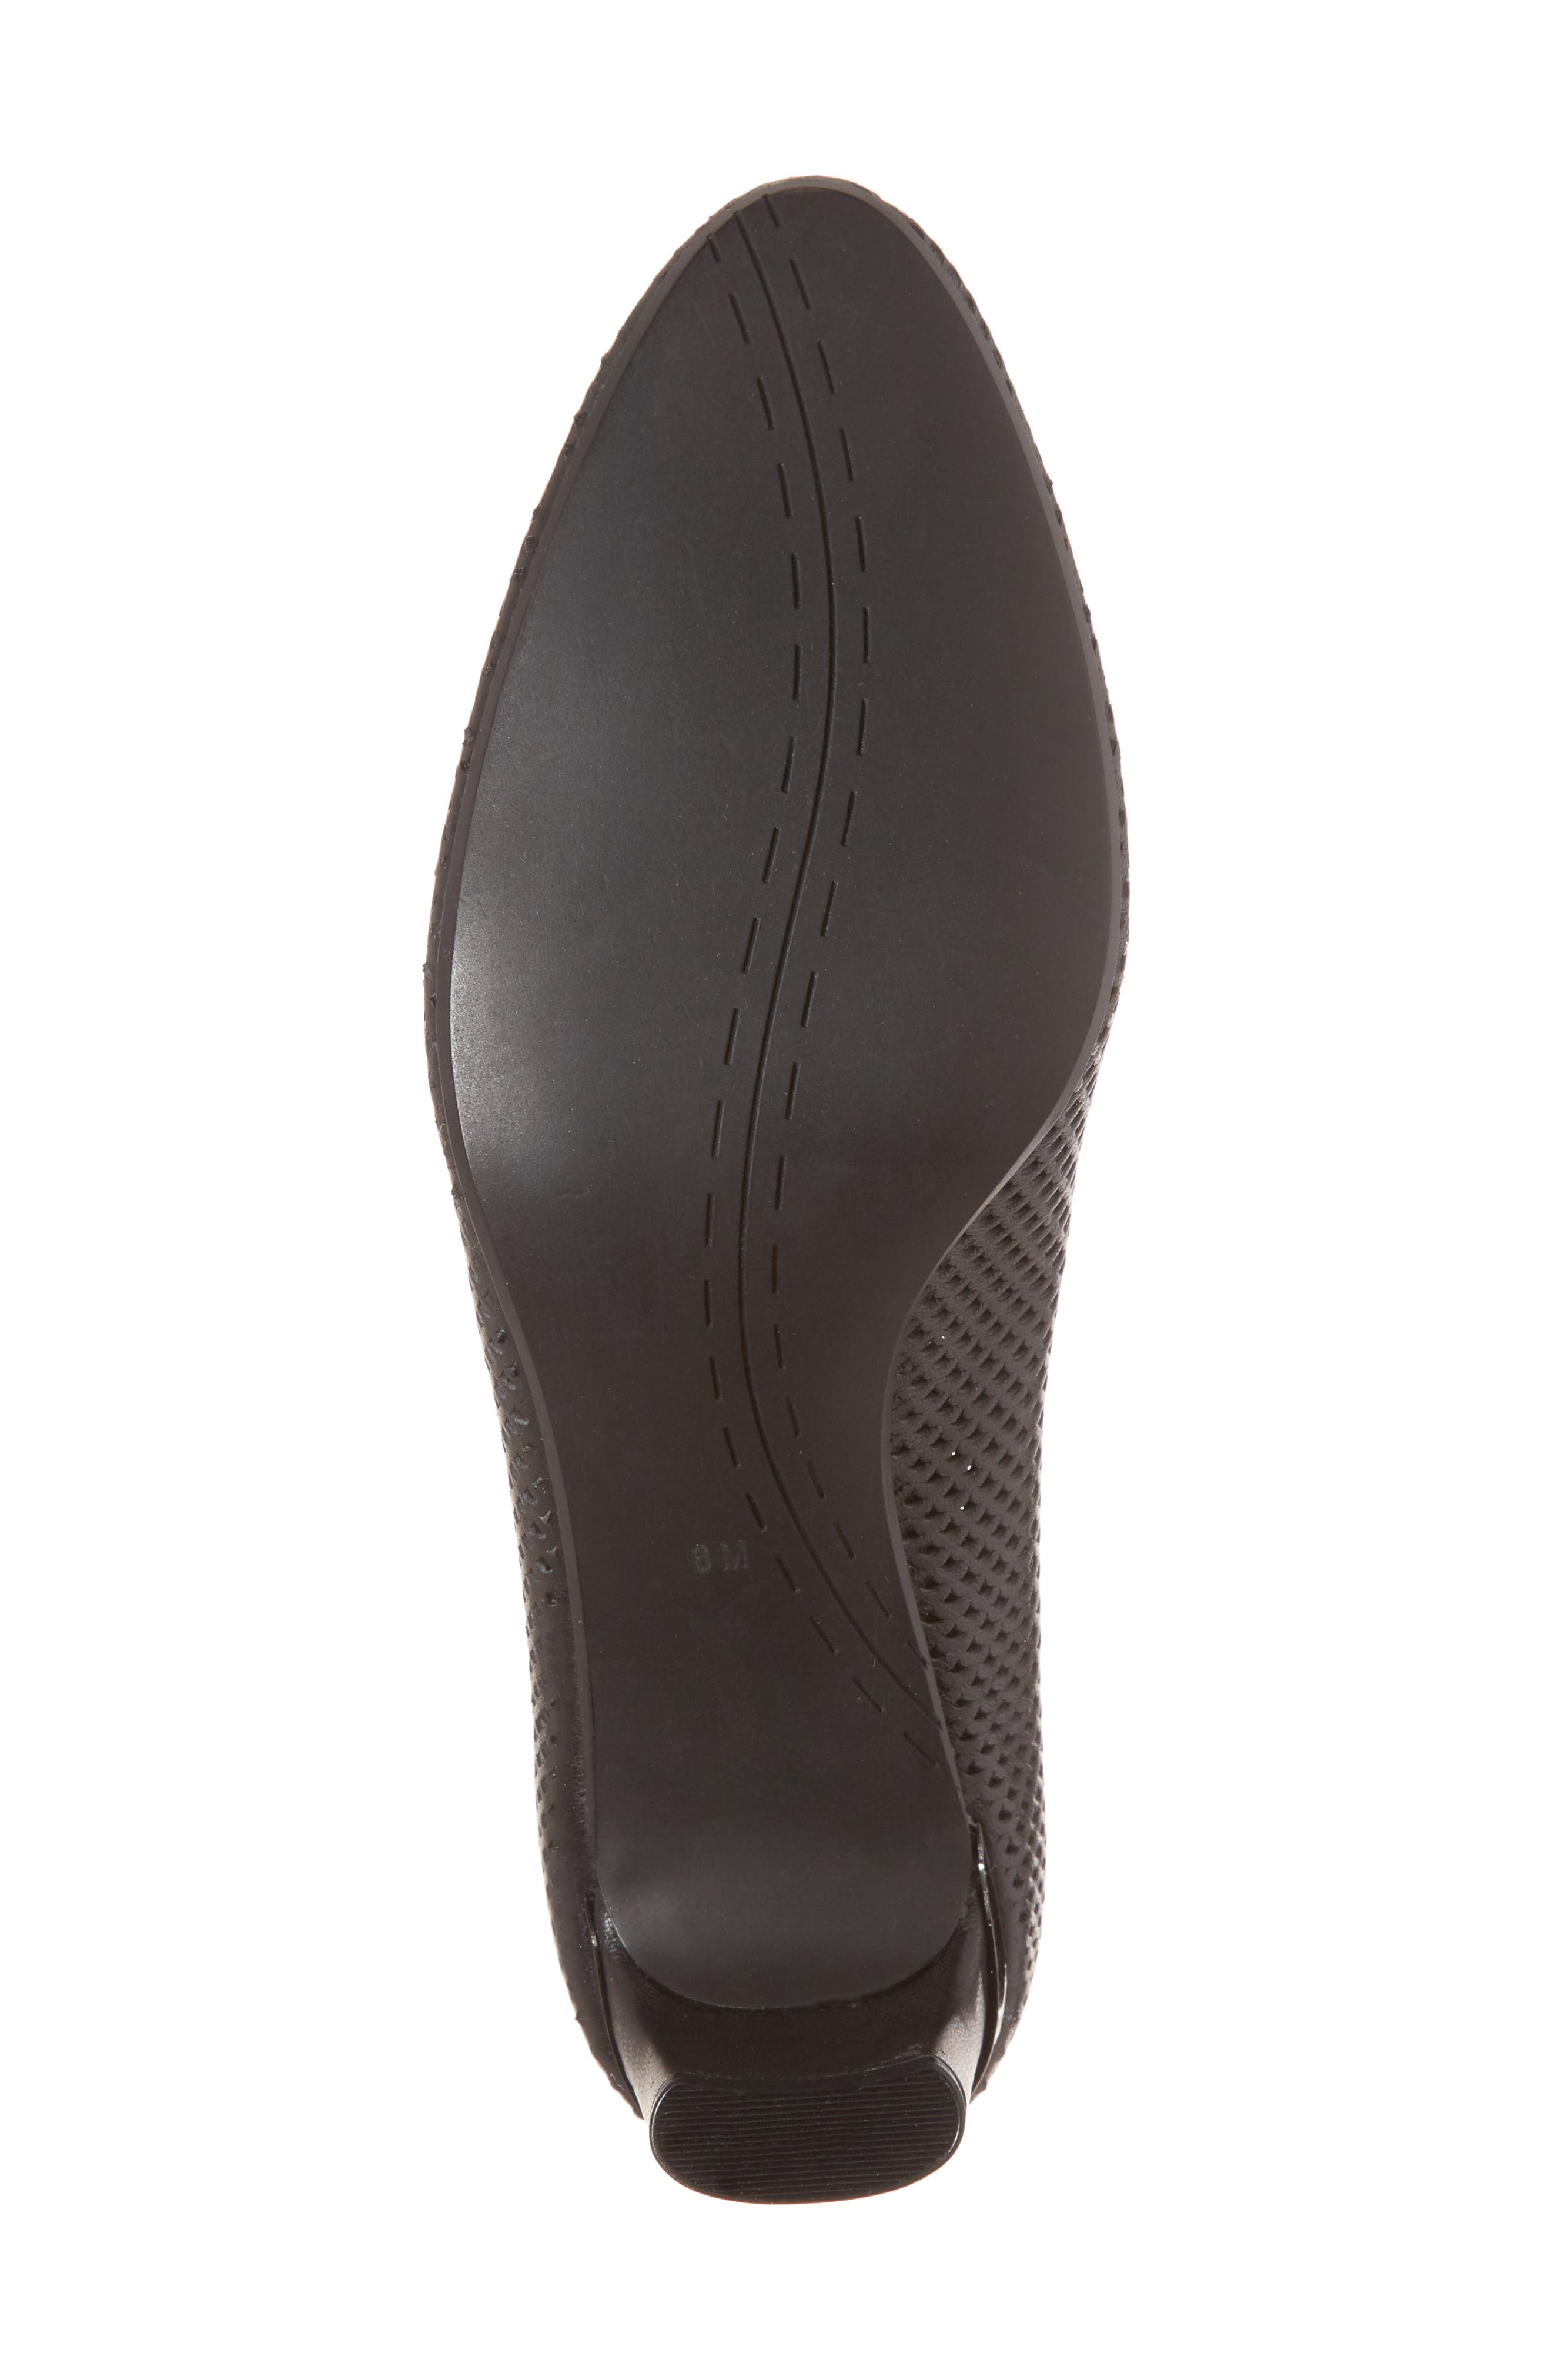 Dawne Pump,                             Alternate thumbnail 6, color,                             Black Leather